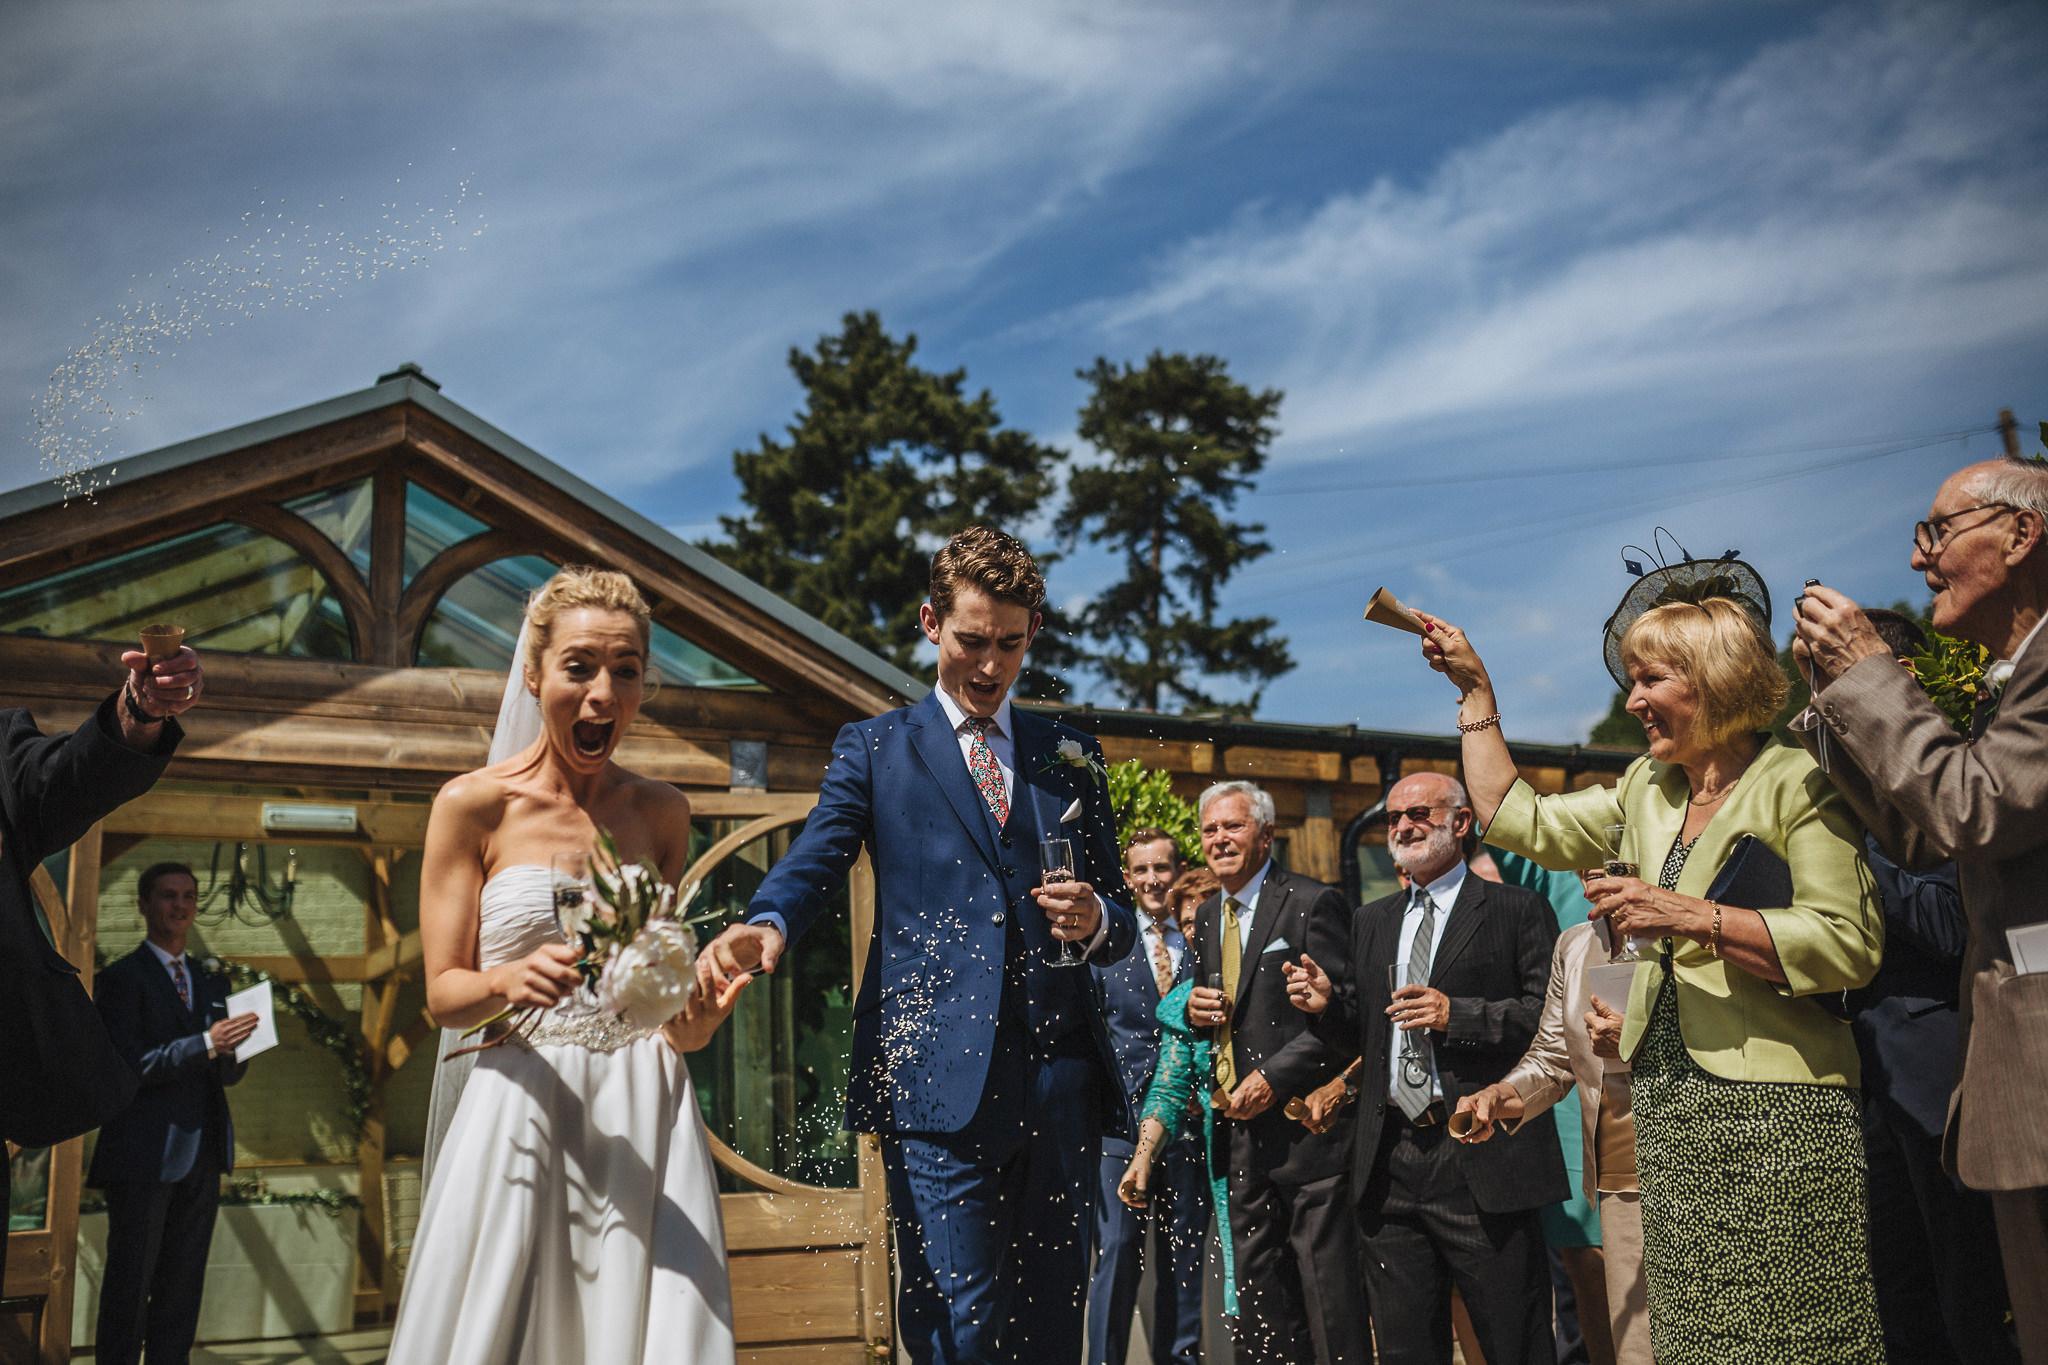 paul-marbrook-Gaynes-Park Wedding-Photographer-90061